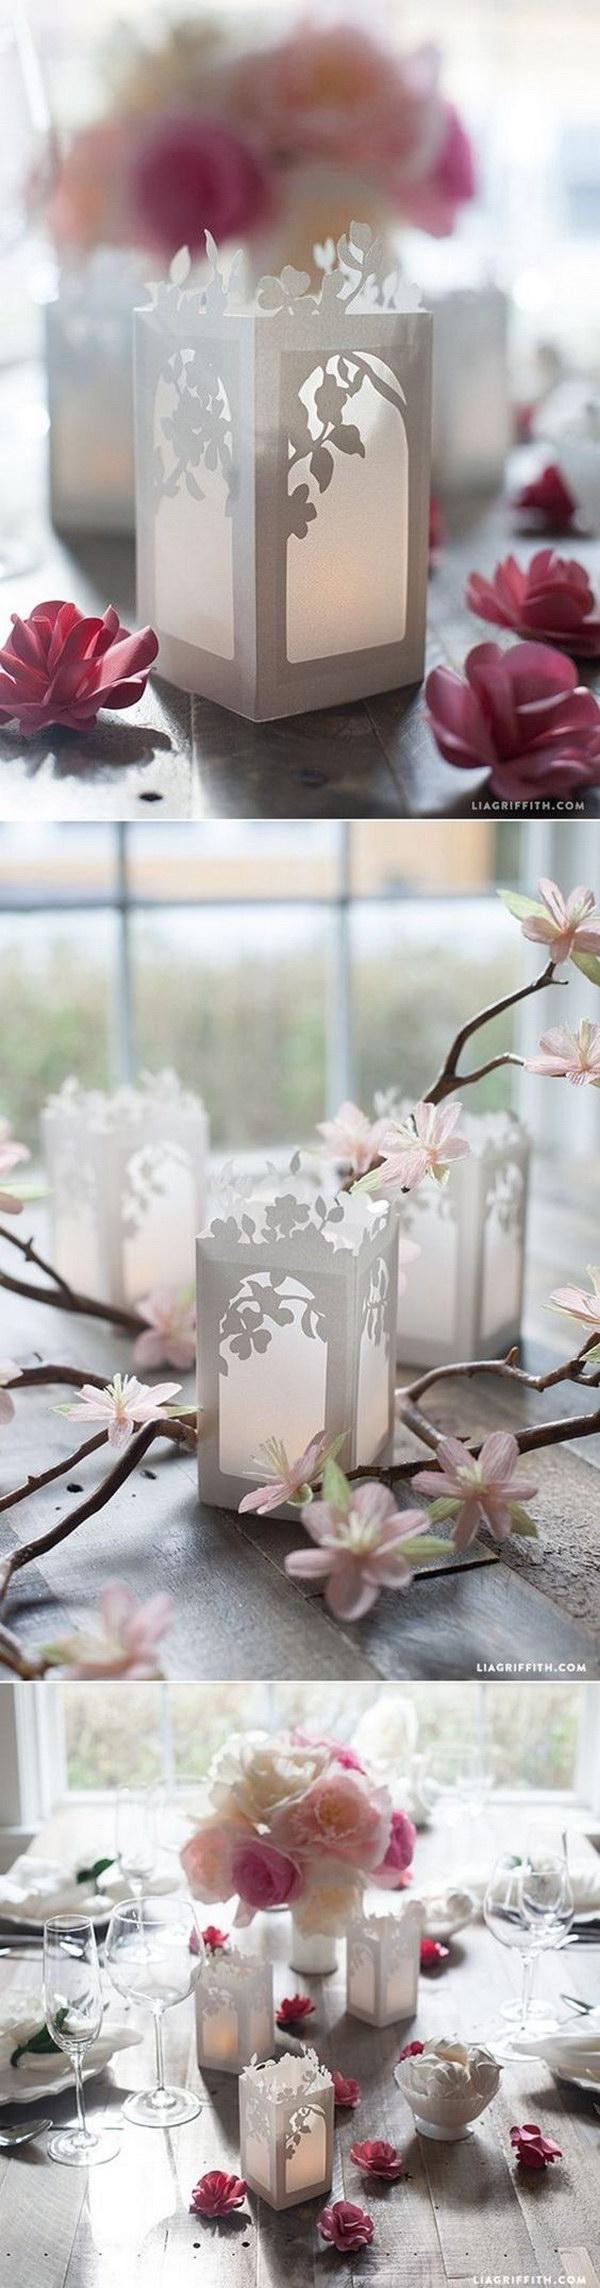 10 DIY Paper Lanterns Wedding Centerpieces